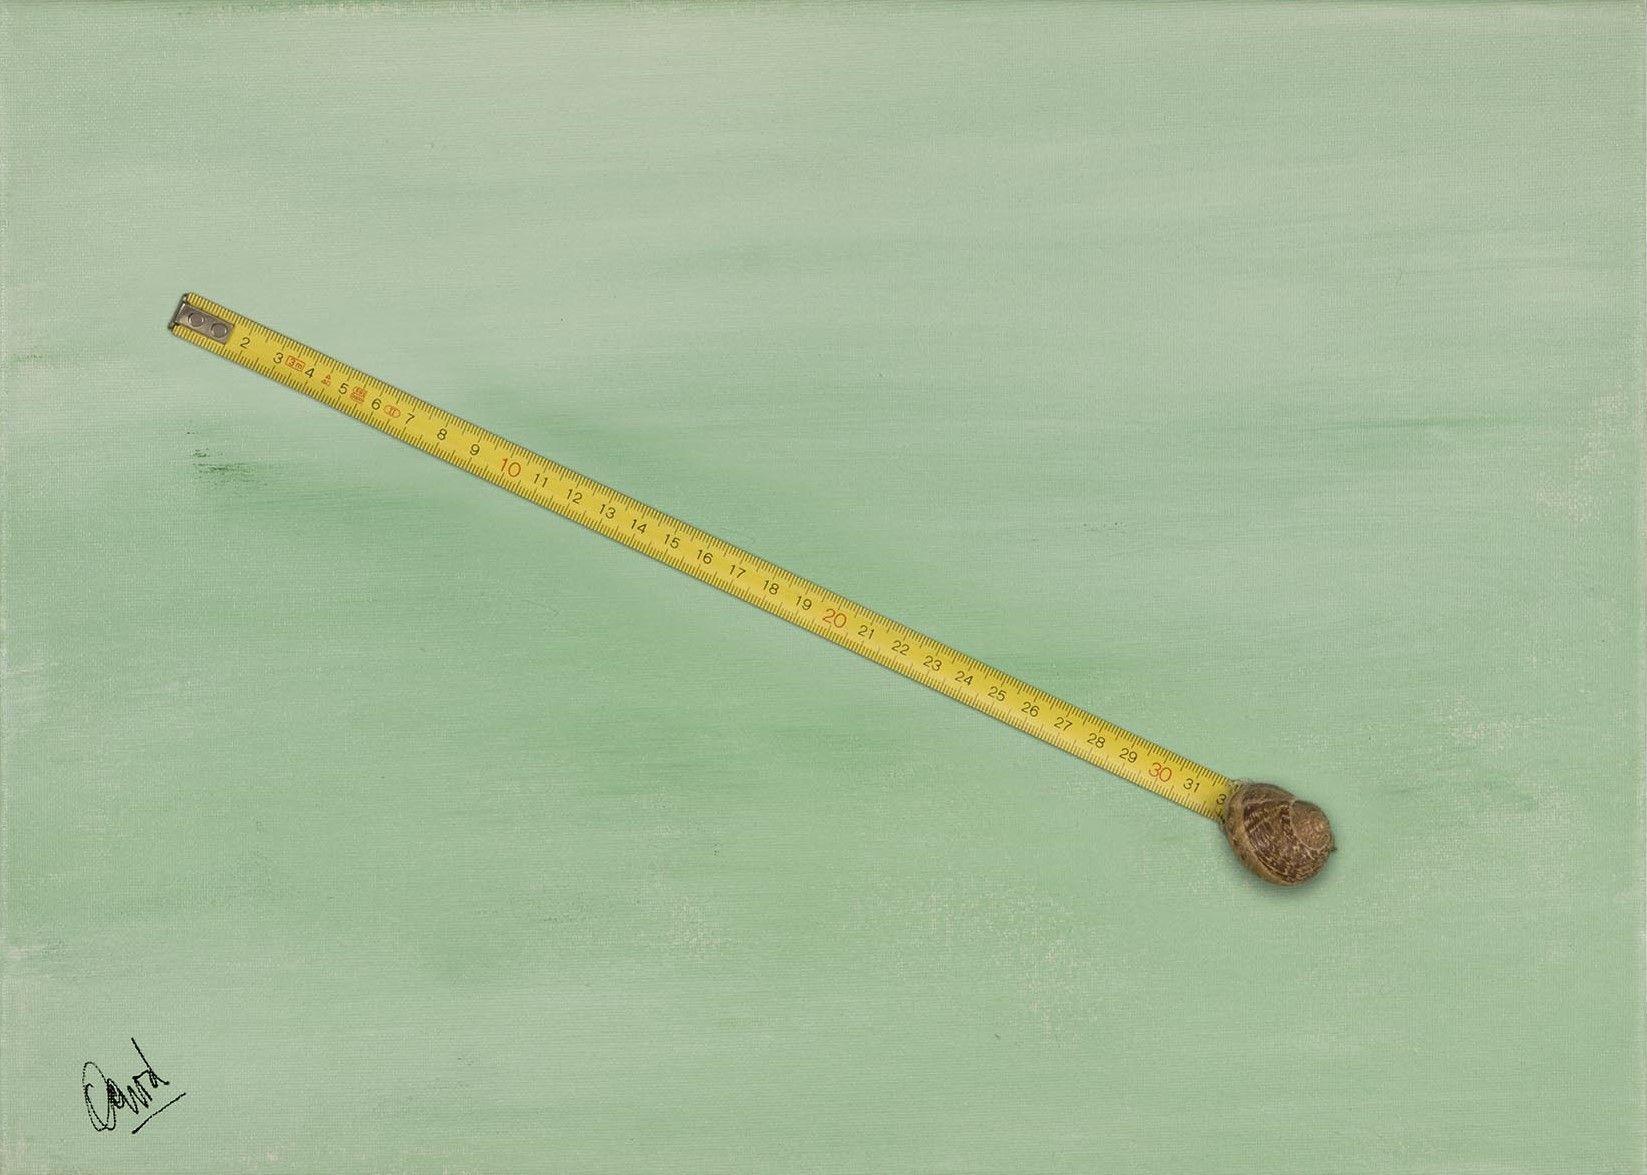 Si un caracol recorre... Poema Visual de David Pérez Pol